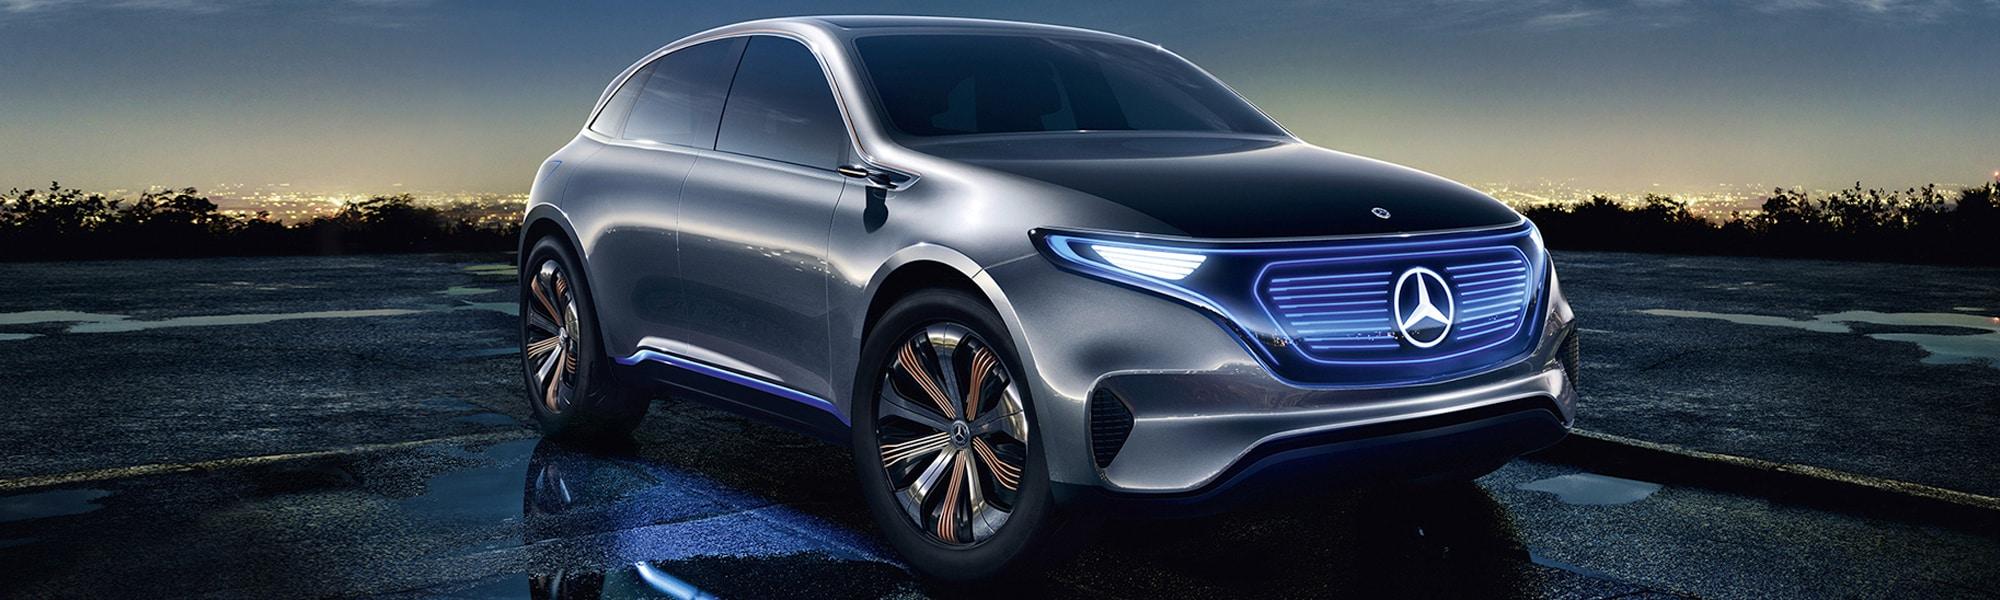 2021 Mercedes-Benz EQC Lease Offers | Tom Masano, Inc.